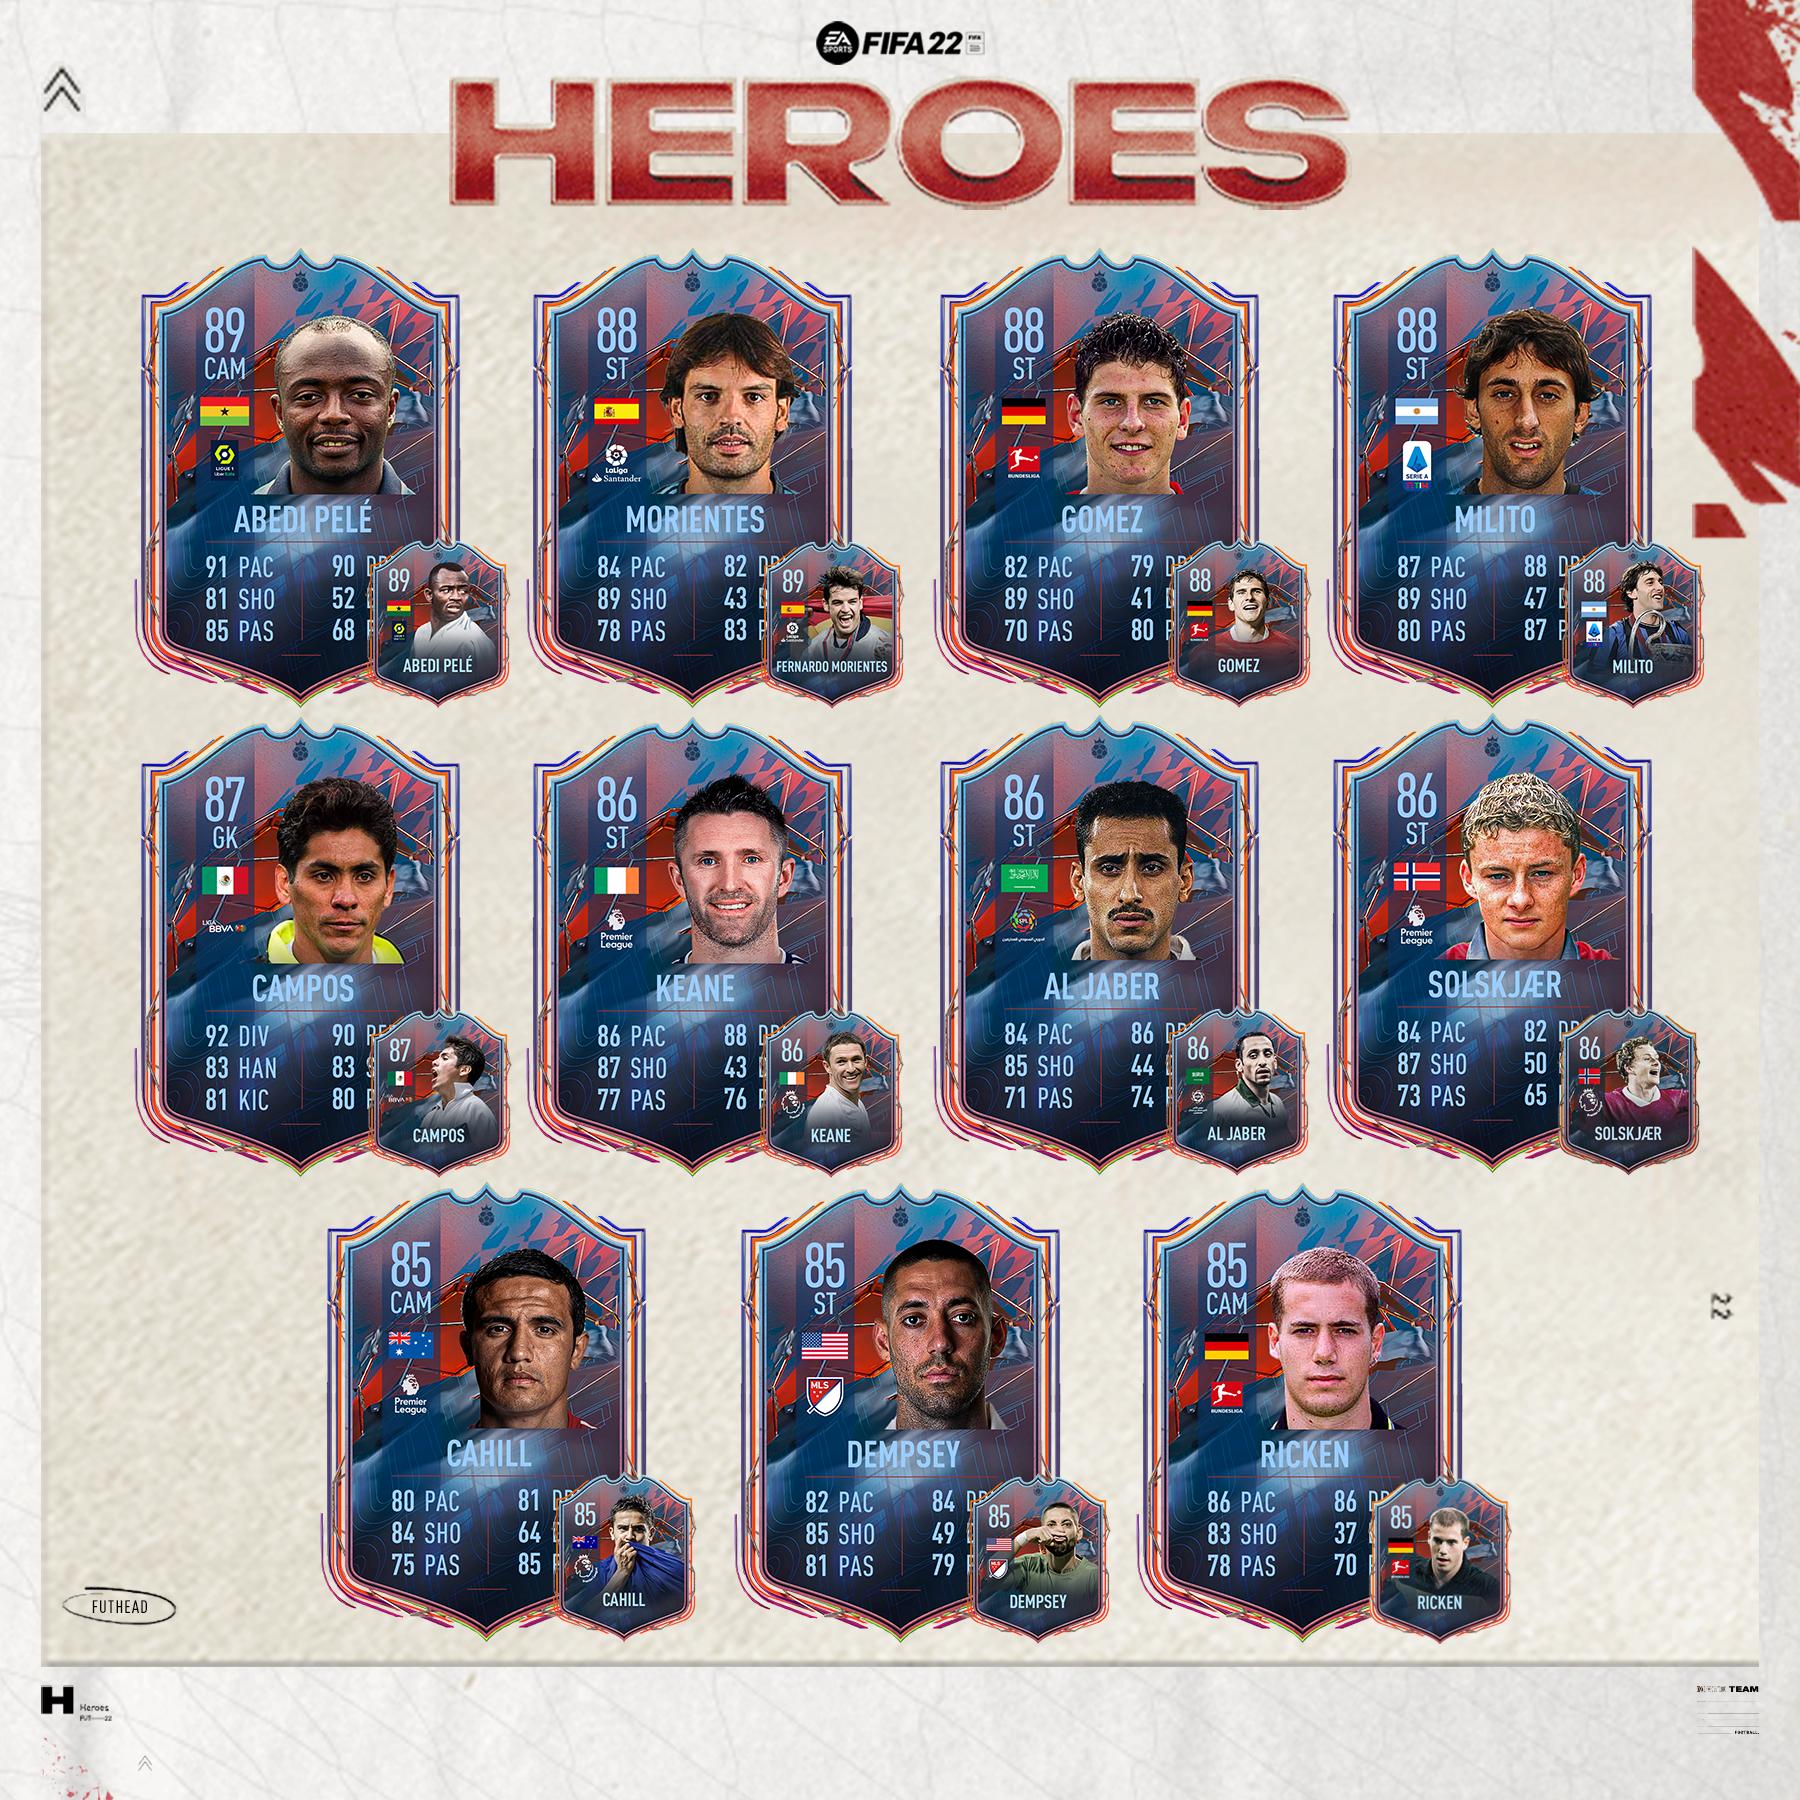 Confirmed Fifa 22 FUT Heroes